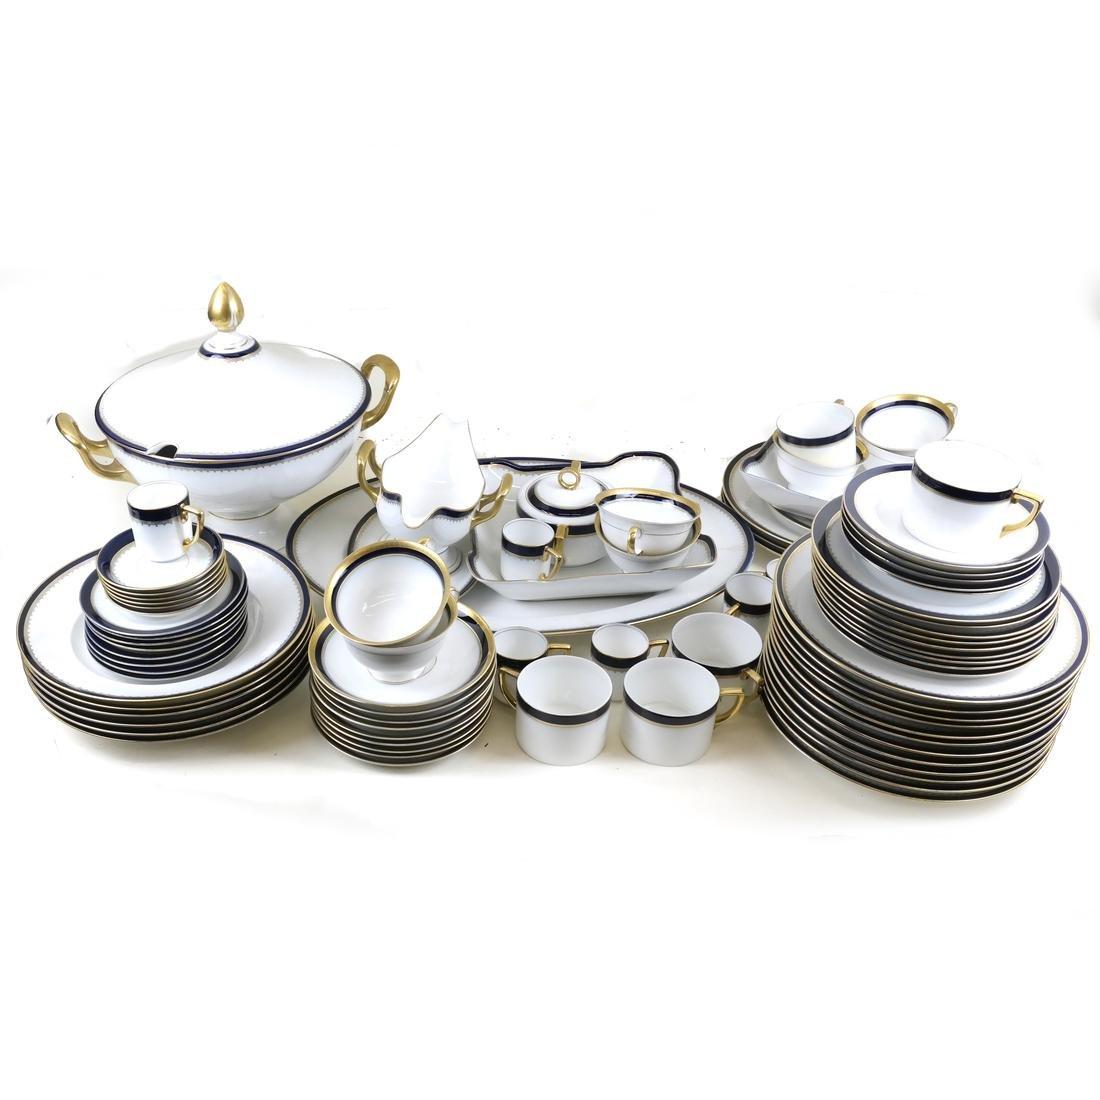 Assembled Rosenthal/Other Porcelain Part Table Service